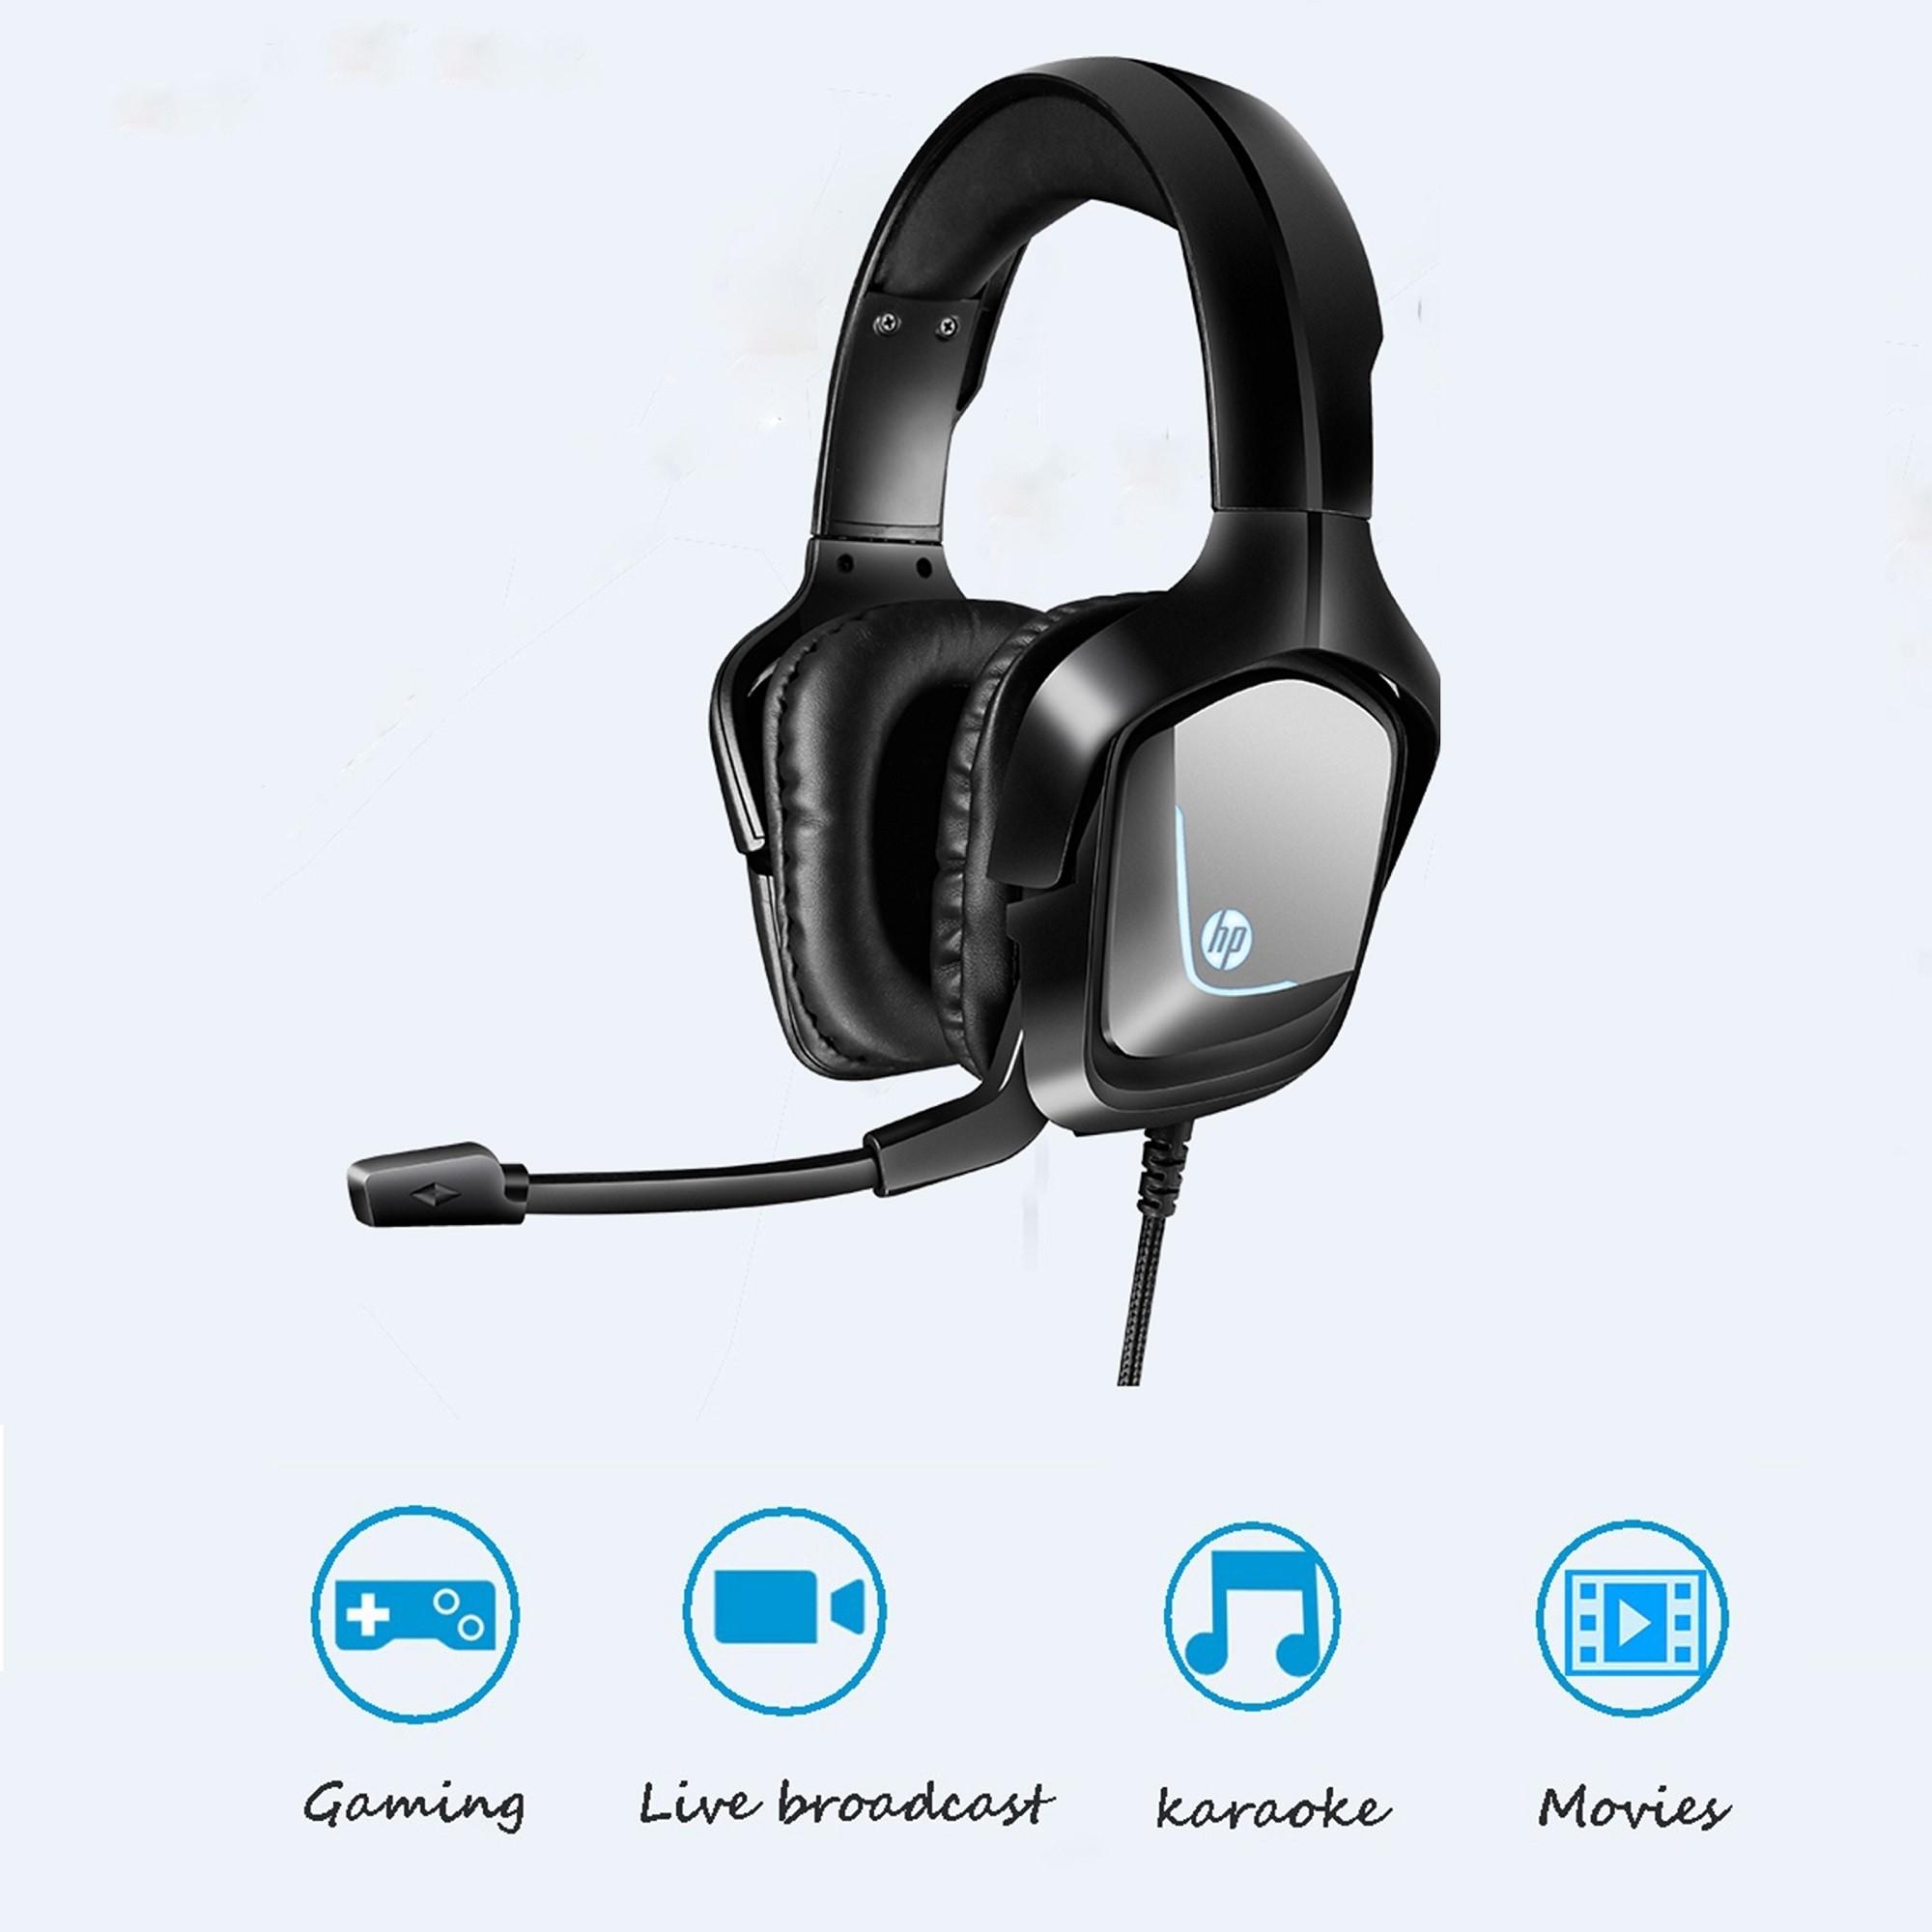 Fone Headset HP Inc GAME 7.1 USB H220GS LED H220GS